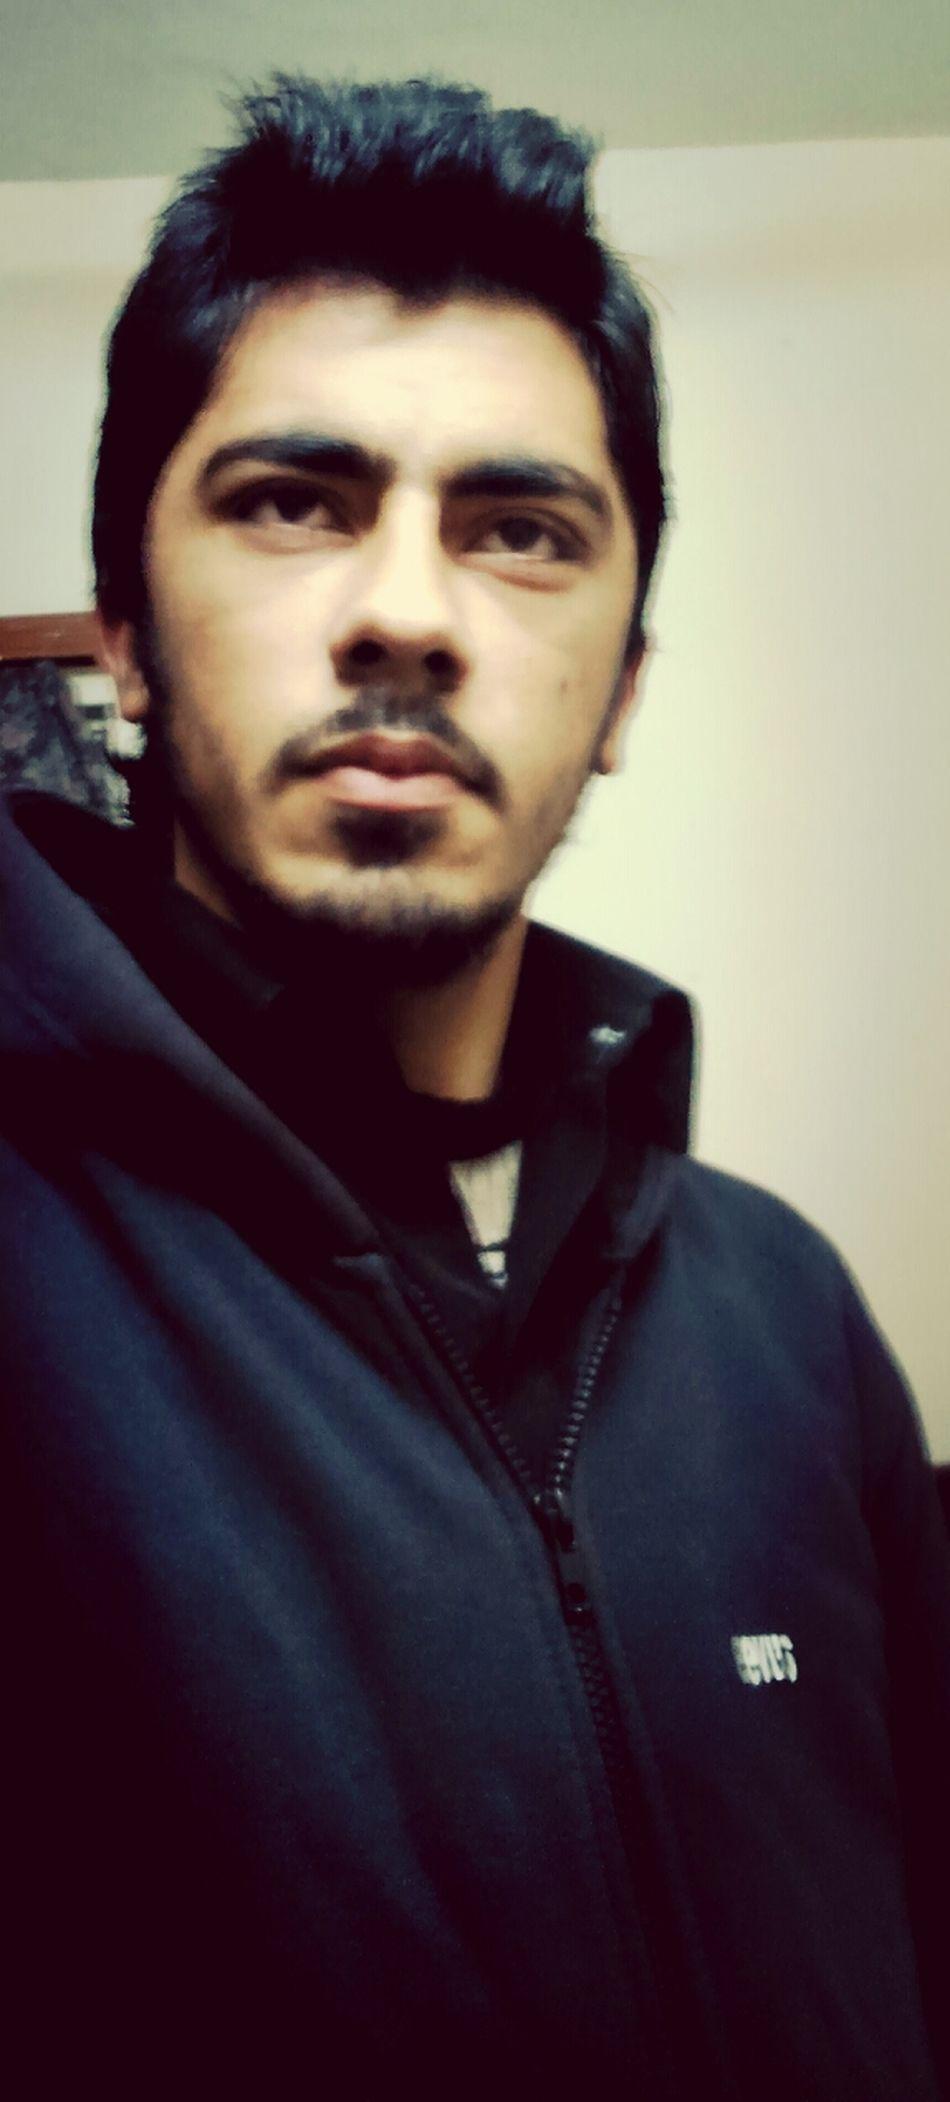 beared noww,,,, :-B